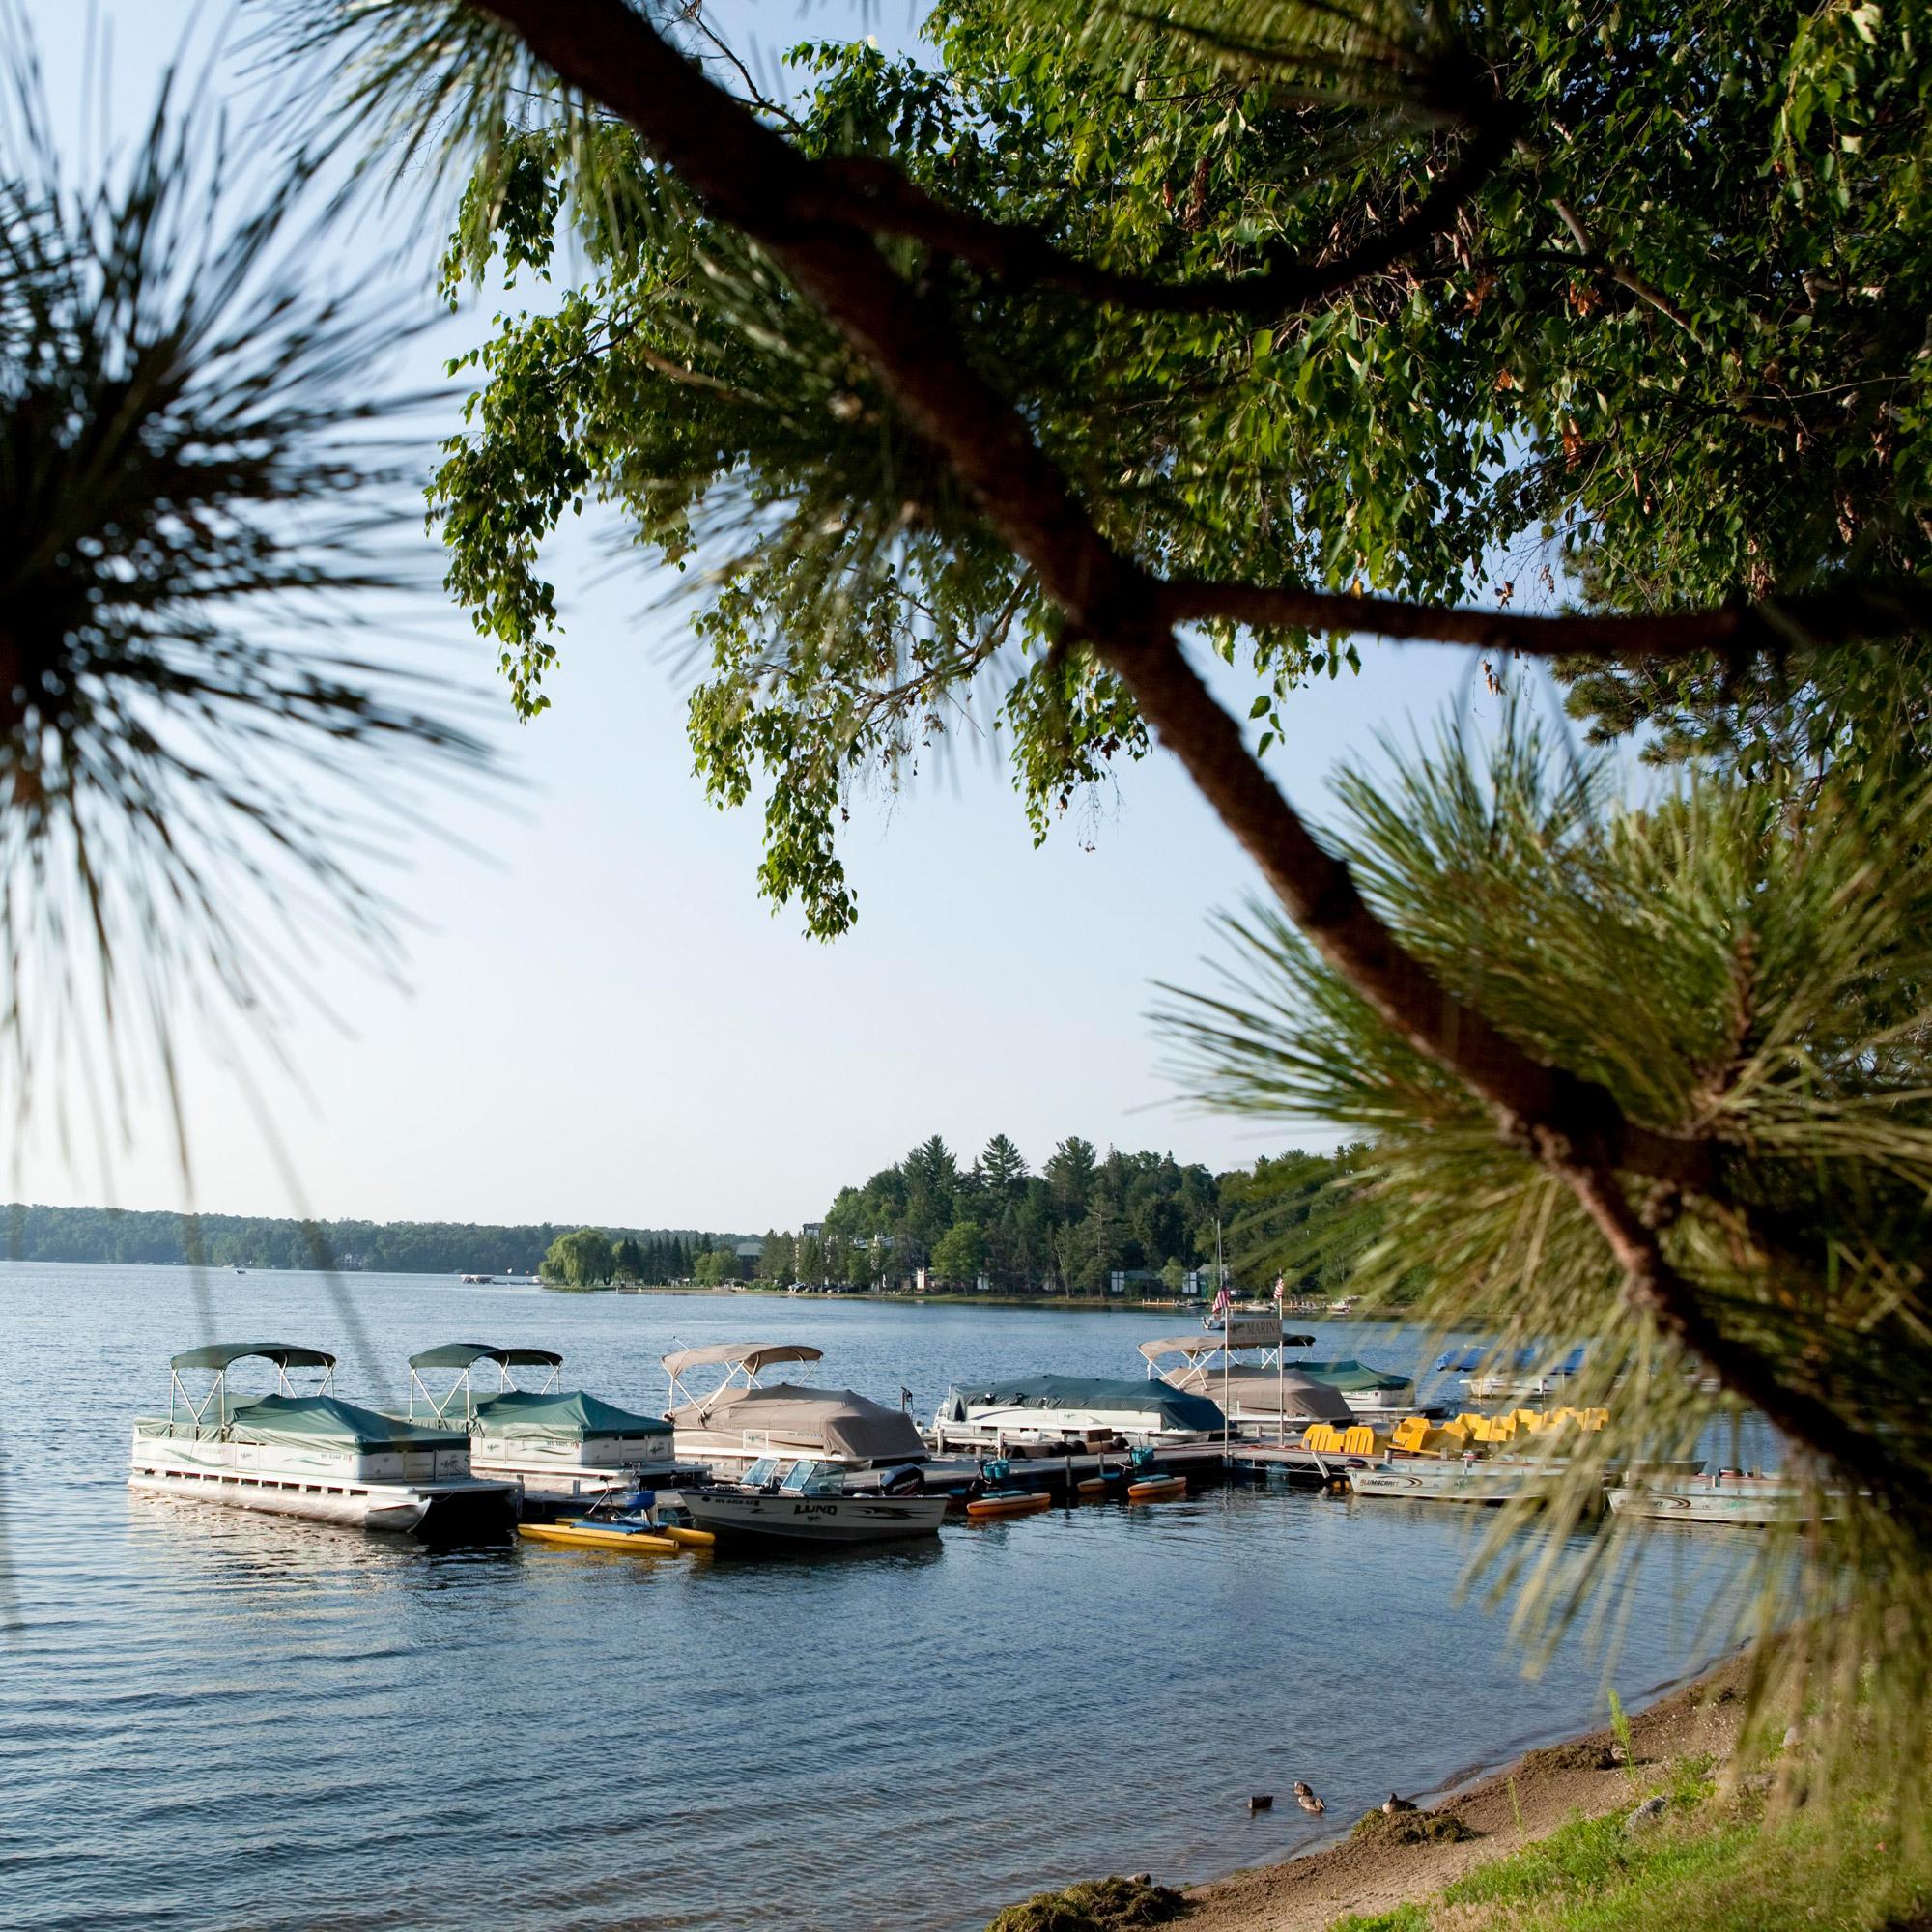 Madden's in Brainerd Lakes Minnesota